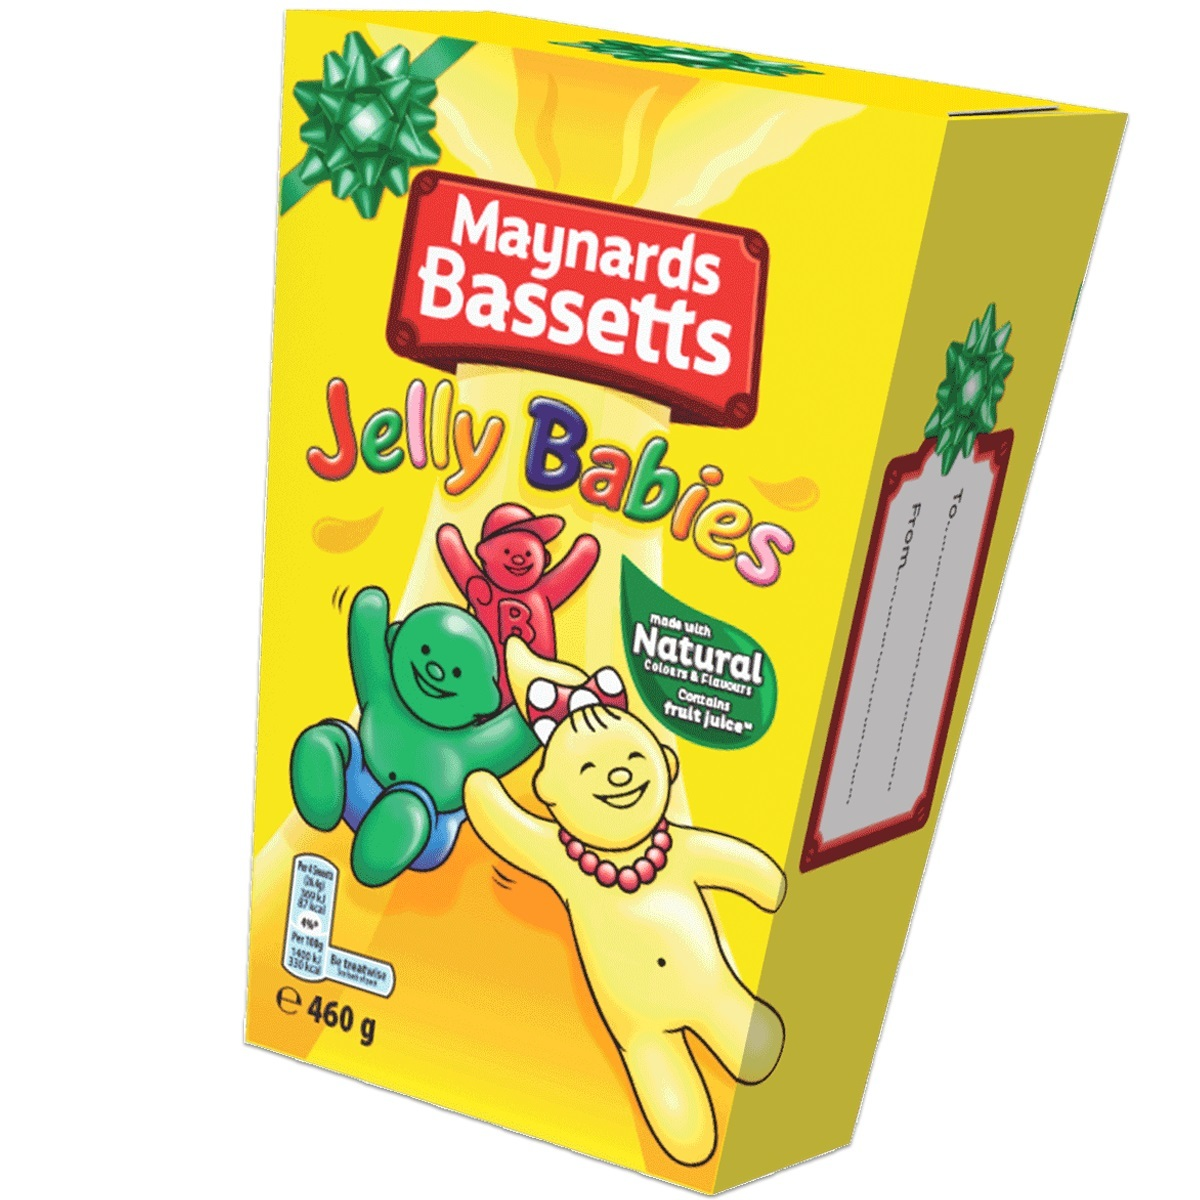 Bassetts Jelly Babies Carton (400g) image